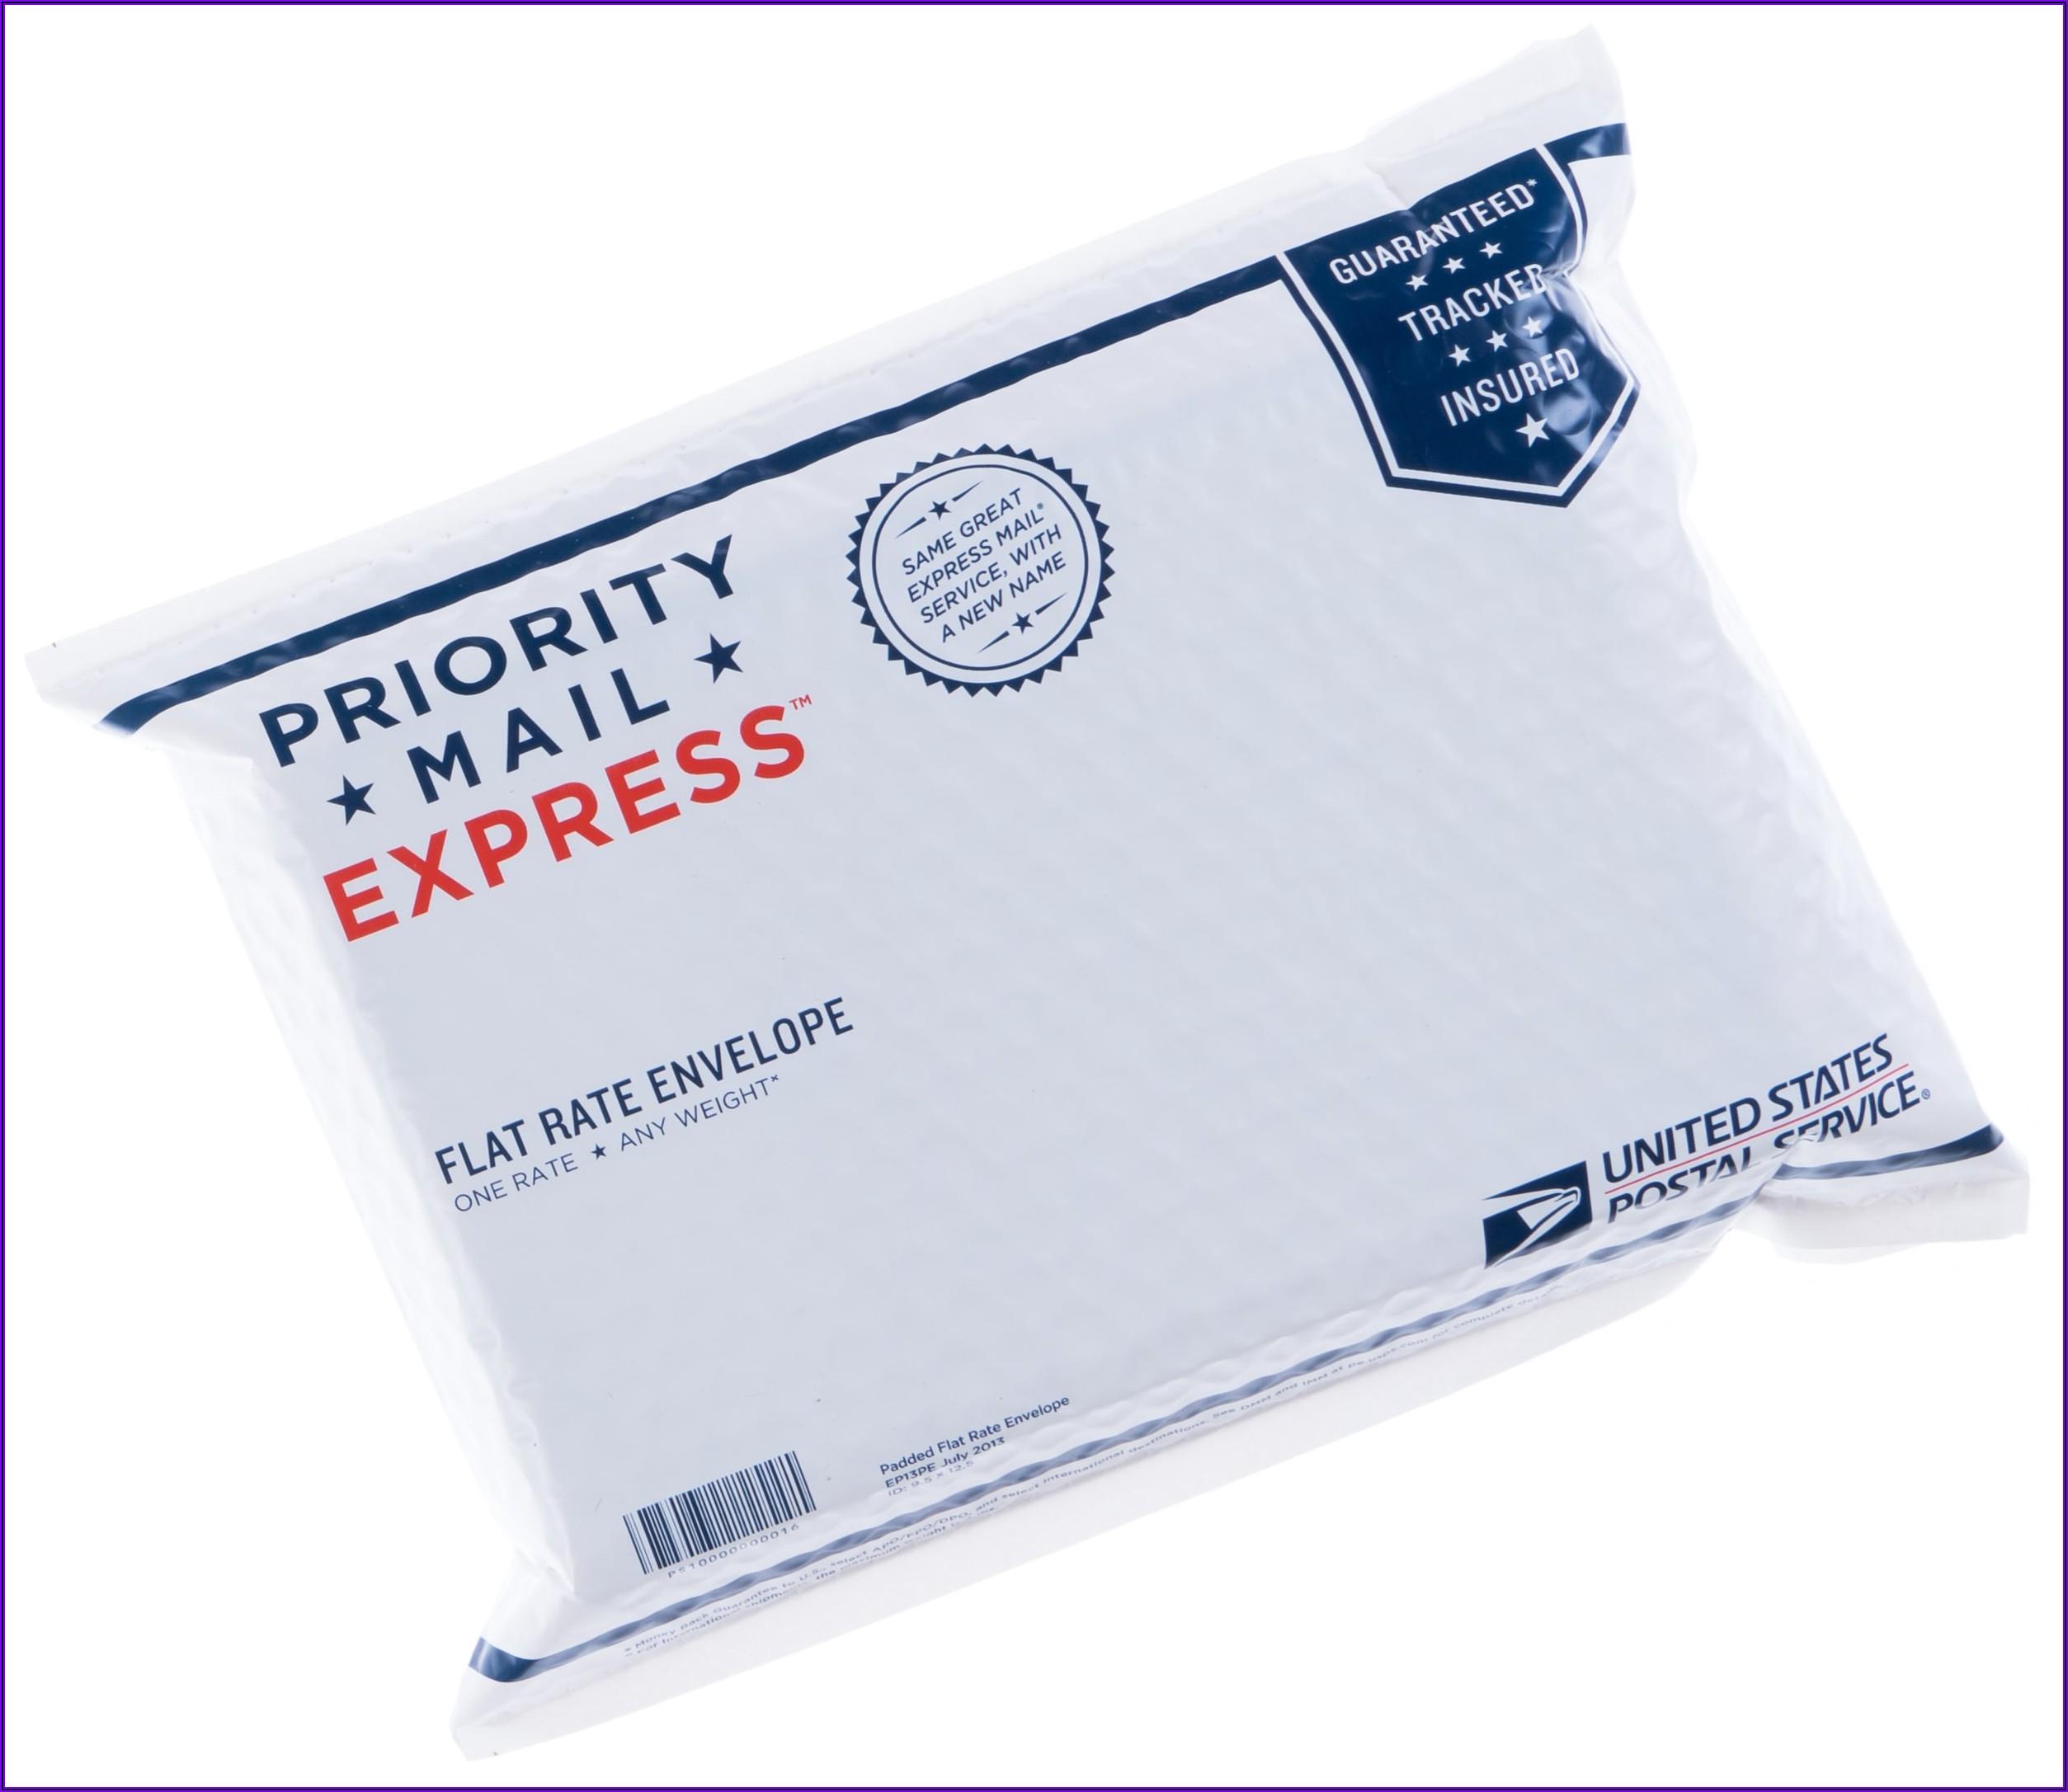 Usps Postal Rates For Padded Envelopes